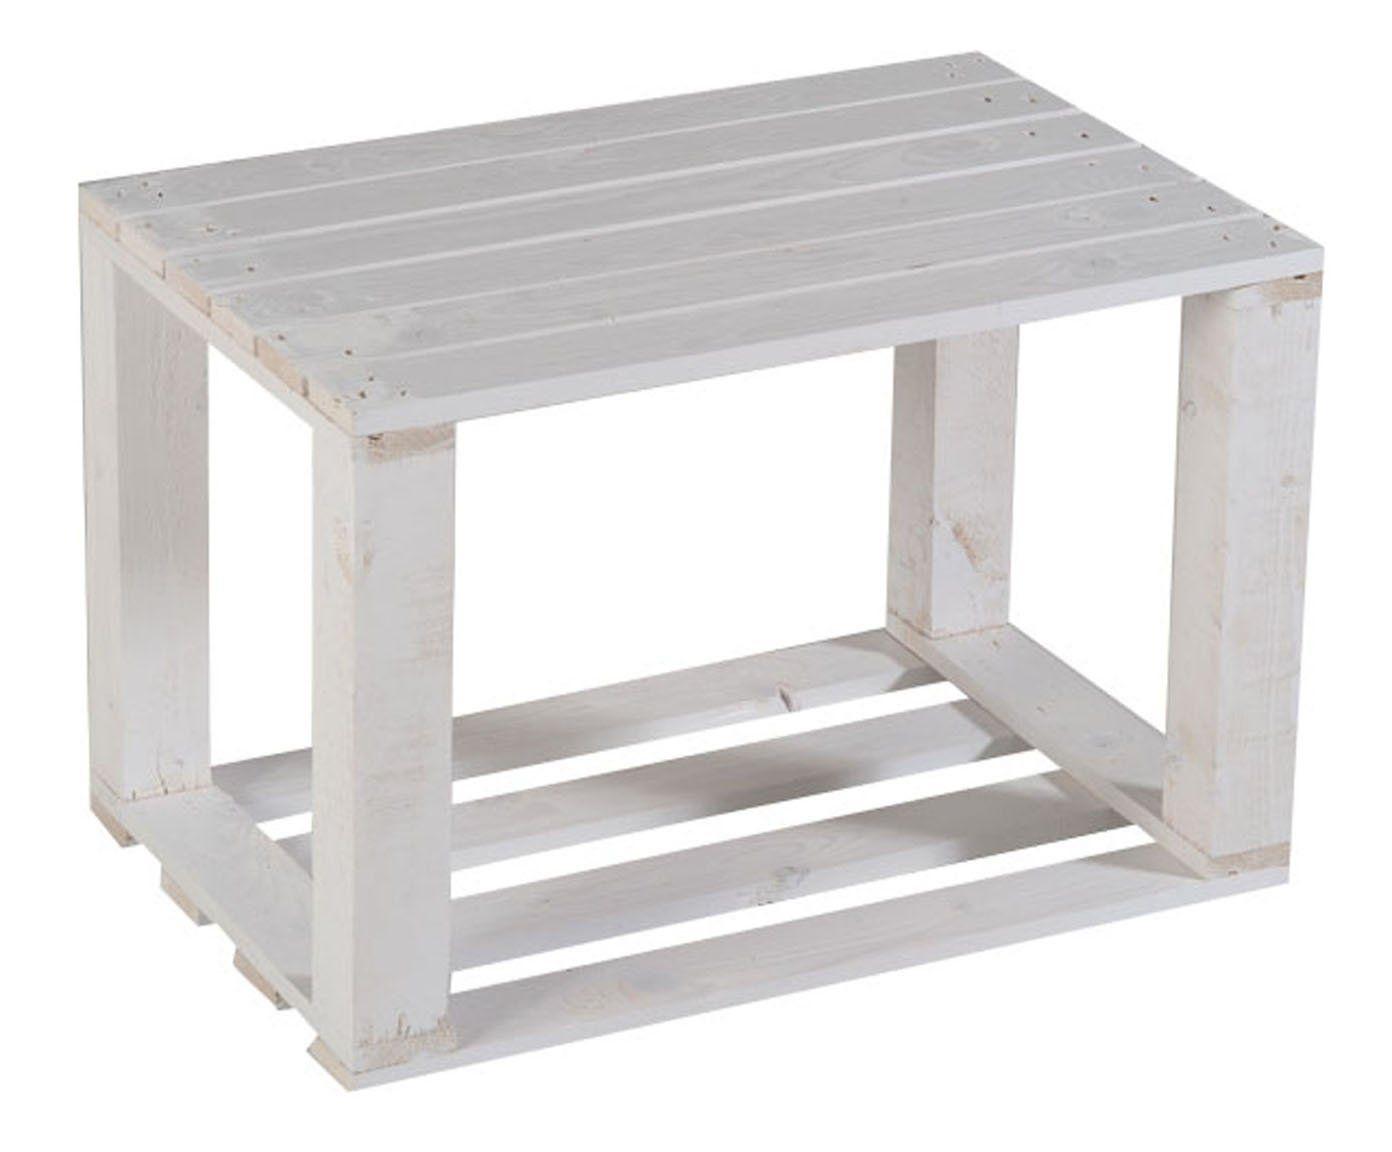 Mobili Castagnetti ~ Castagnetti 1928 pallet tavolino panchetta legno abete bianco